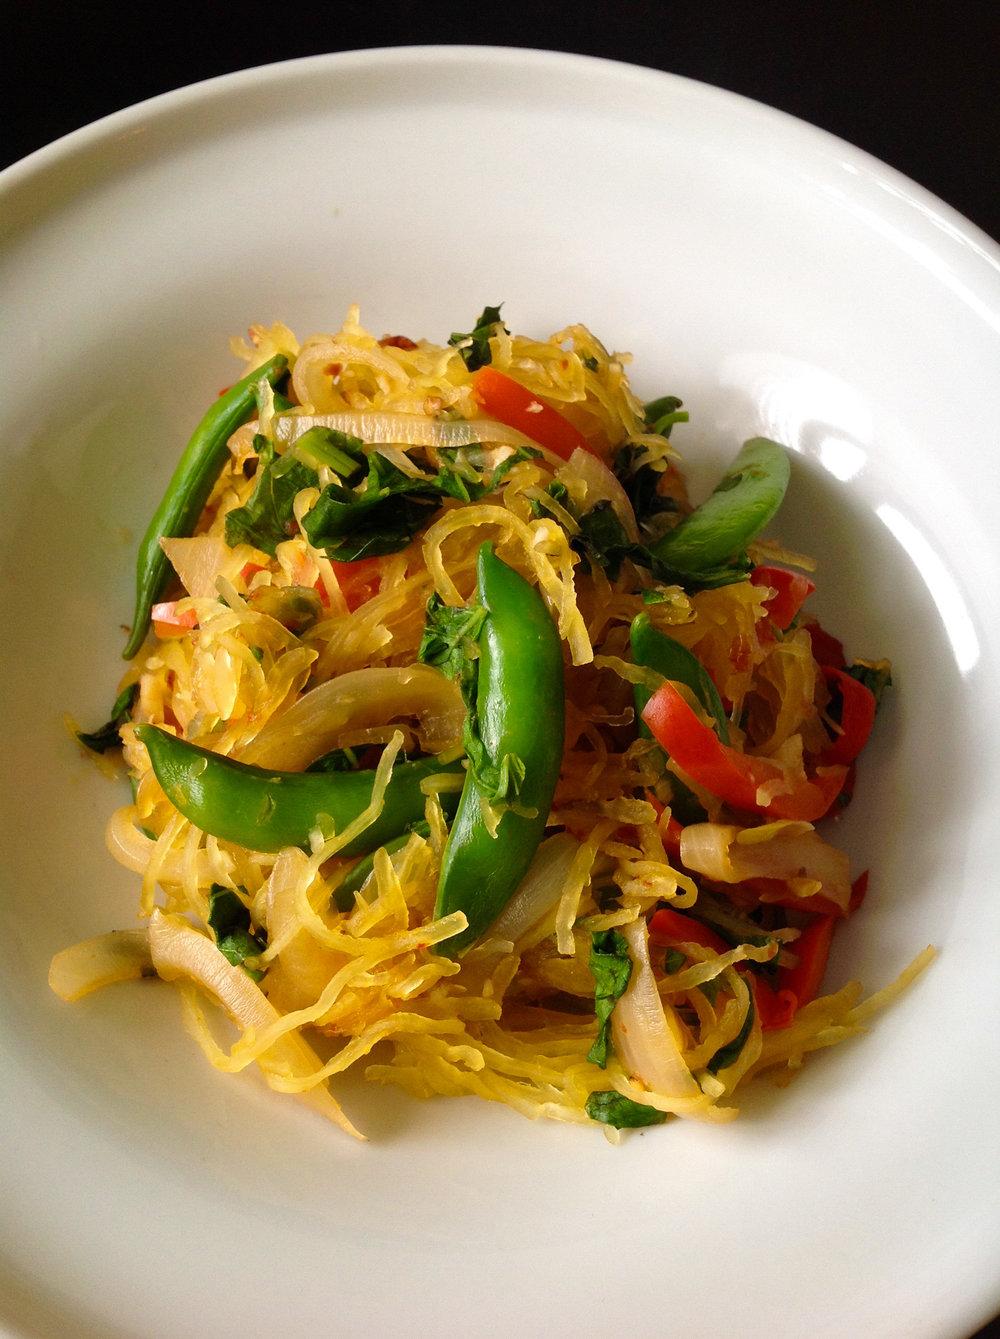 Thai Spicy Basil Spaghetti Squash - Healthy, Gluten-Free, Low-Carb Vegan Entree; Can add beef, chicken, tofu, or shrimp